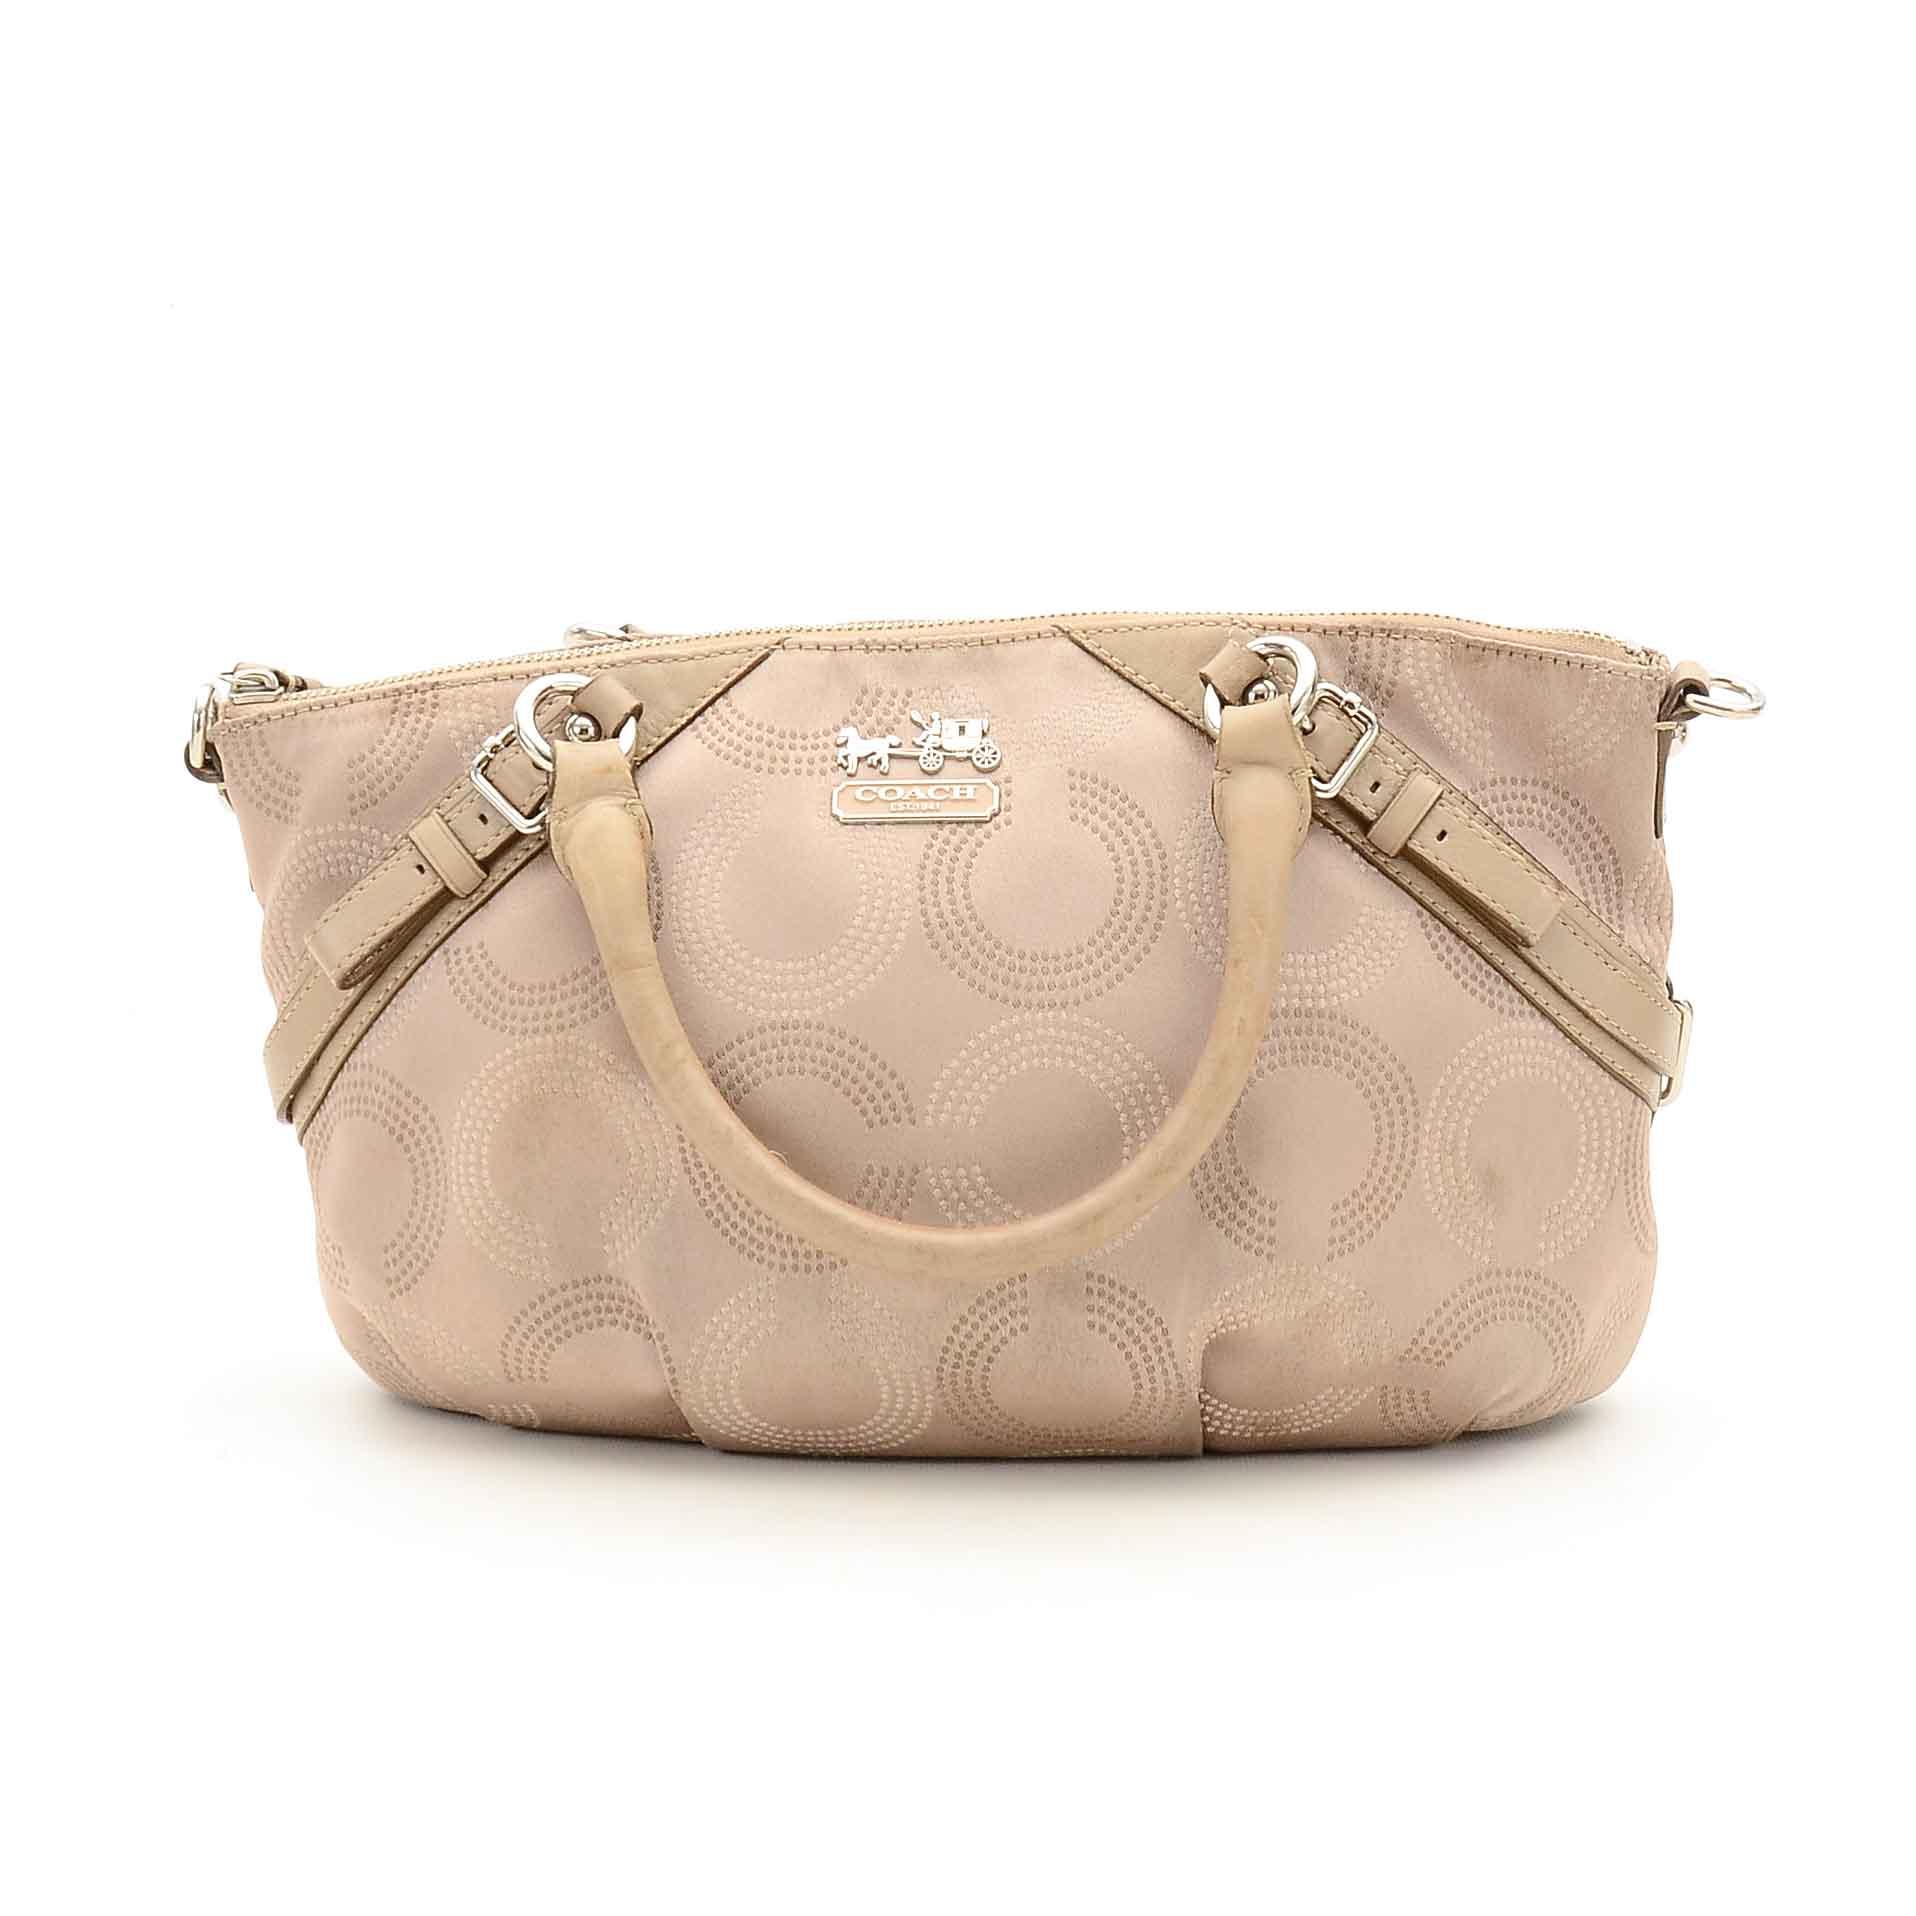 6781e002b9e2 ... shoulder bag 89714 41260  reduced coach madison op art sophia satchel  9a408 0cbc9